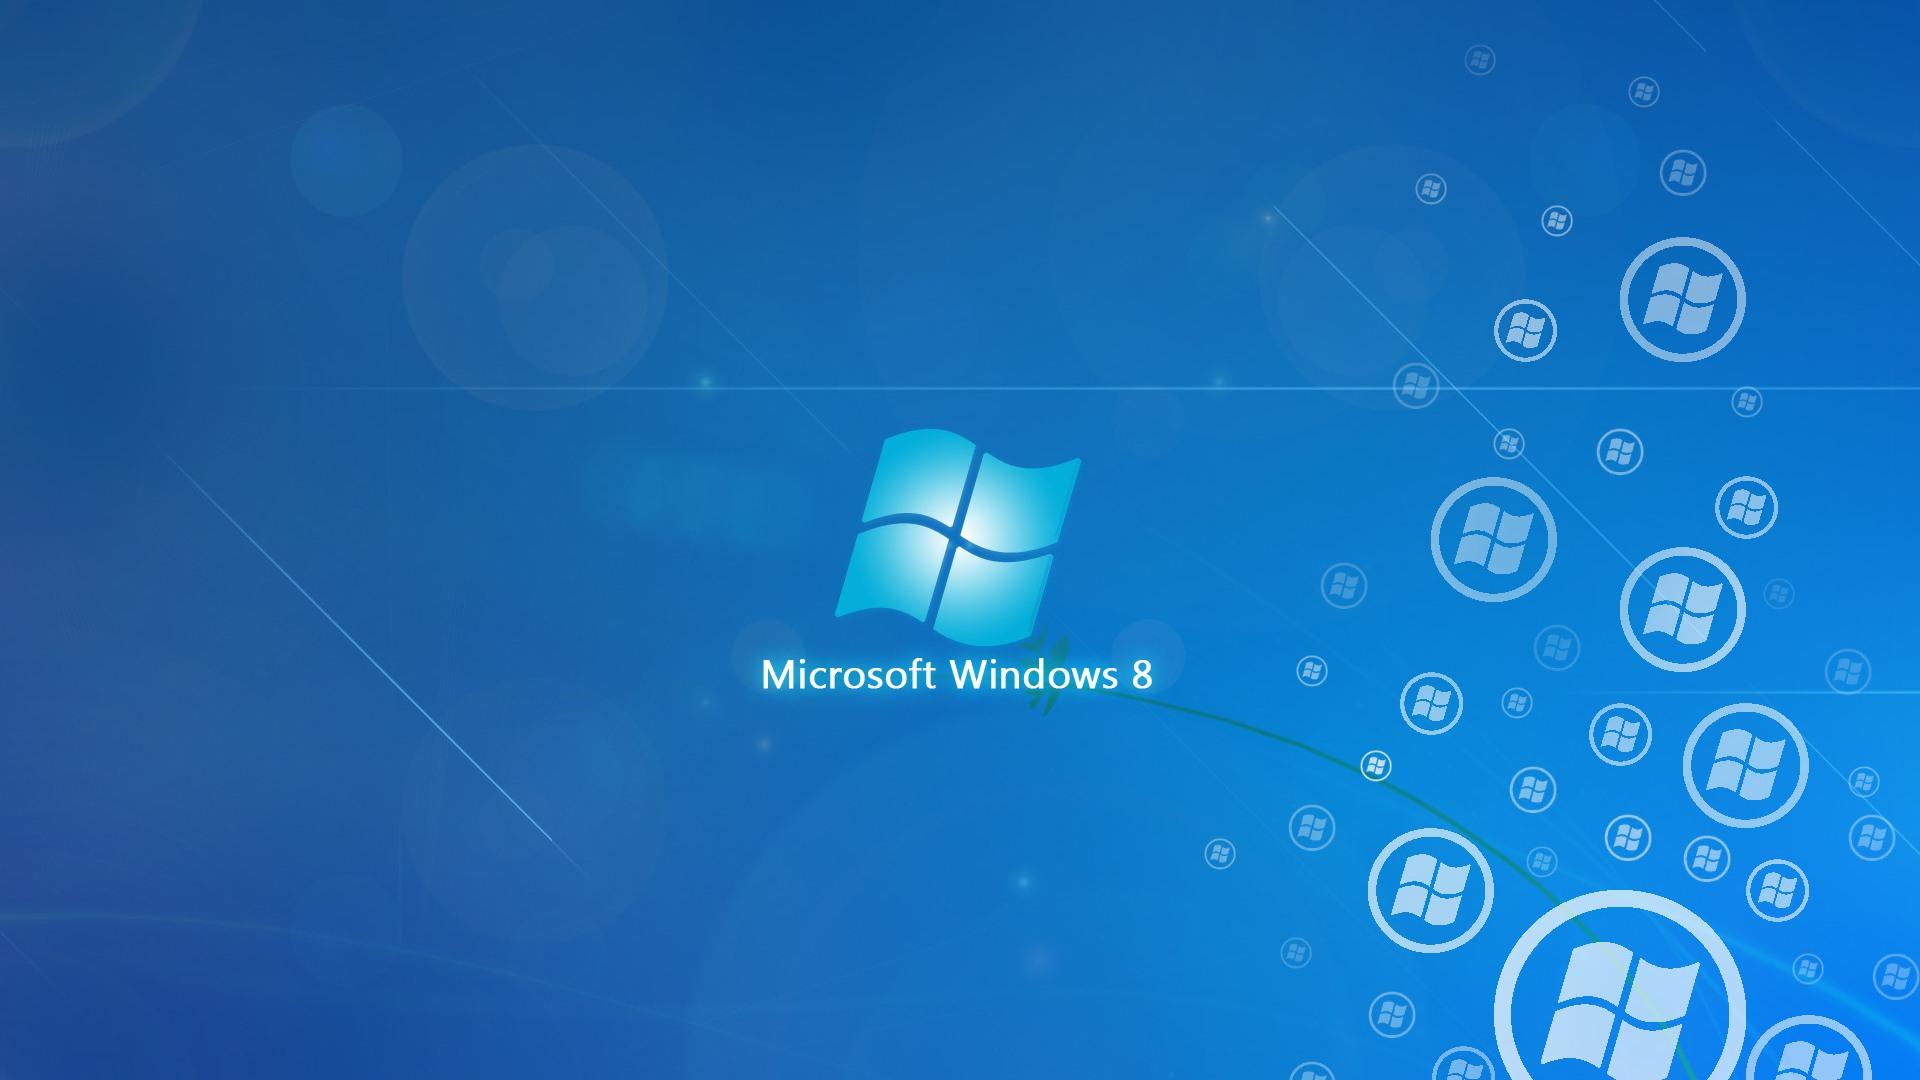 Fond d 39 cran windows 8 theme 2 18 1920x1080 fond d for Theme ecran